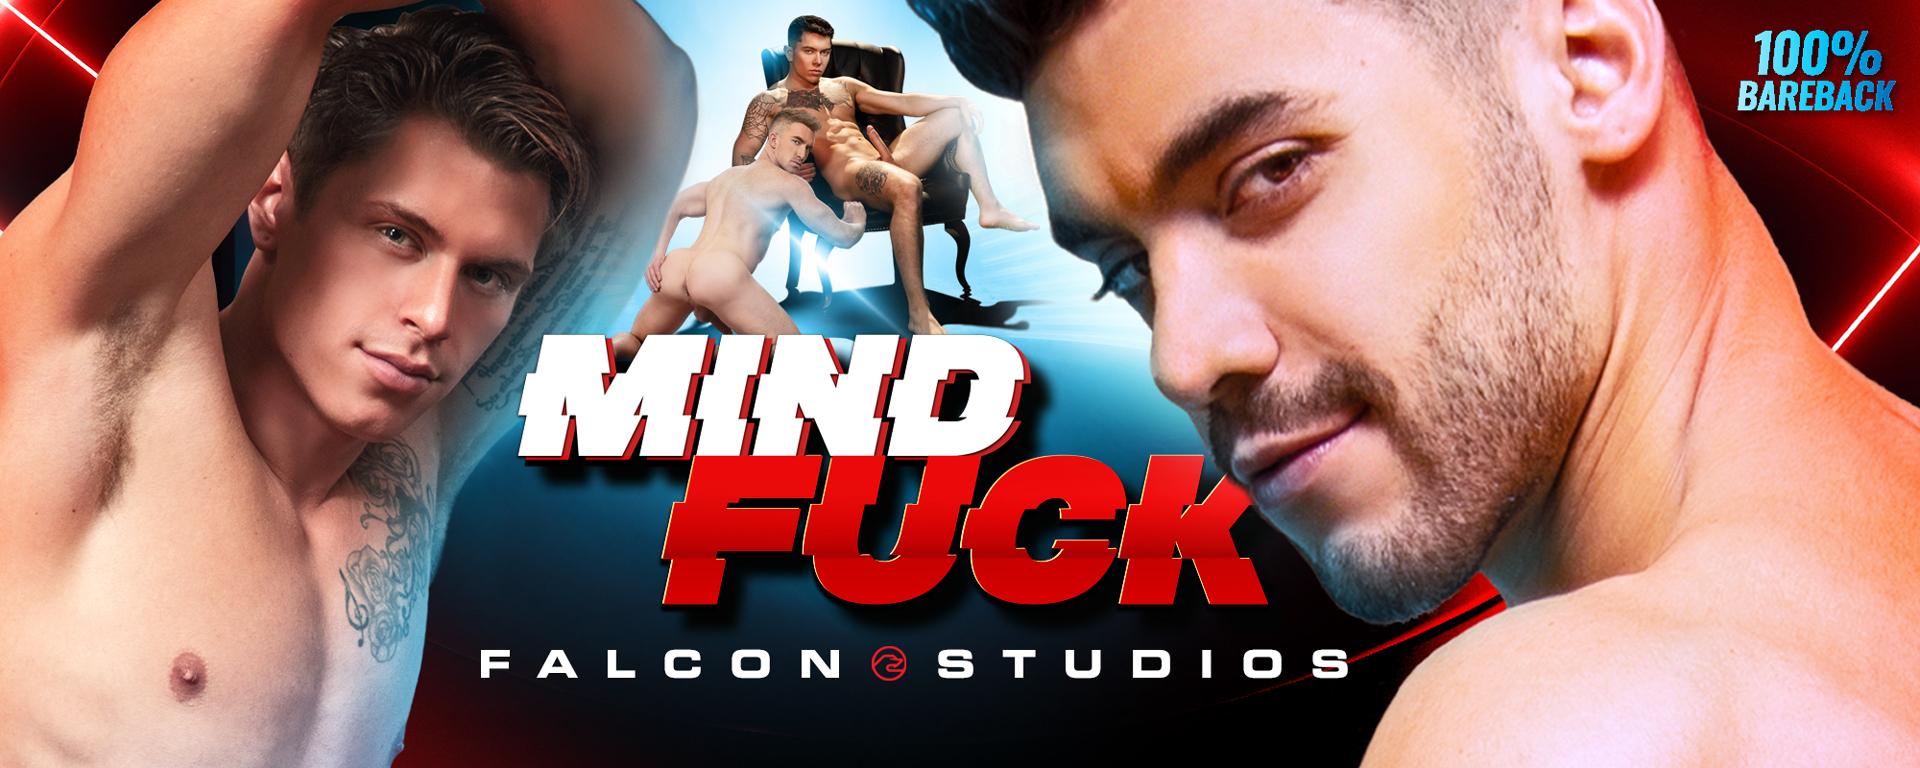 Falcon Studios MindFuck